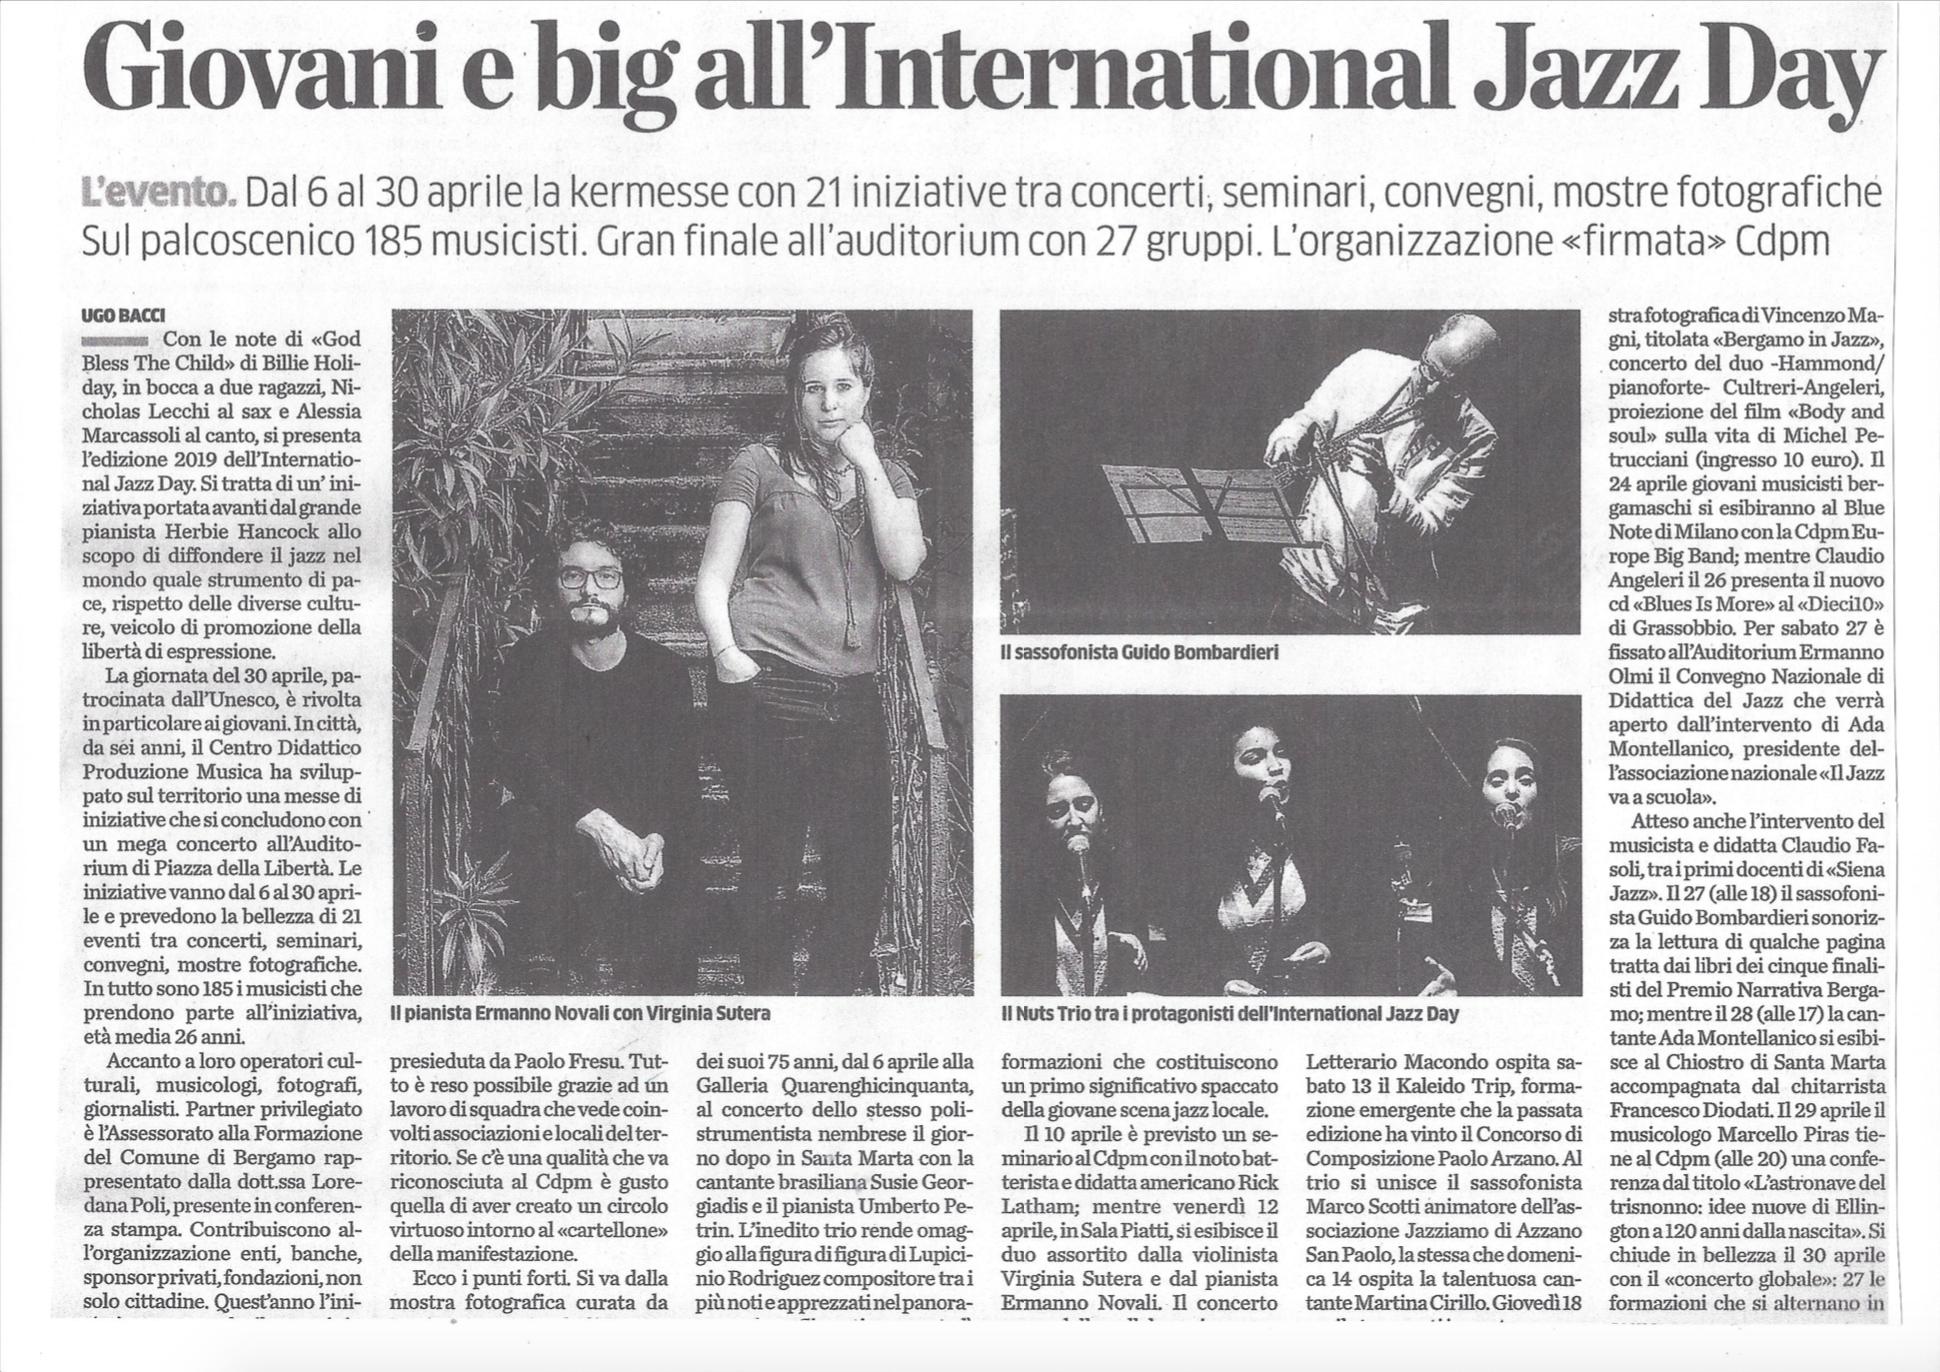 Internatonal Jazz Day